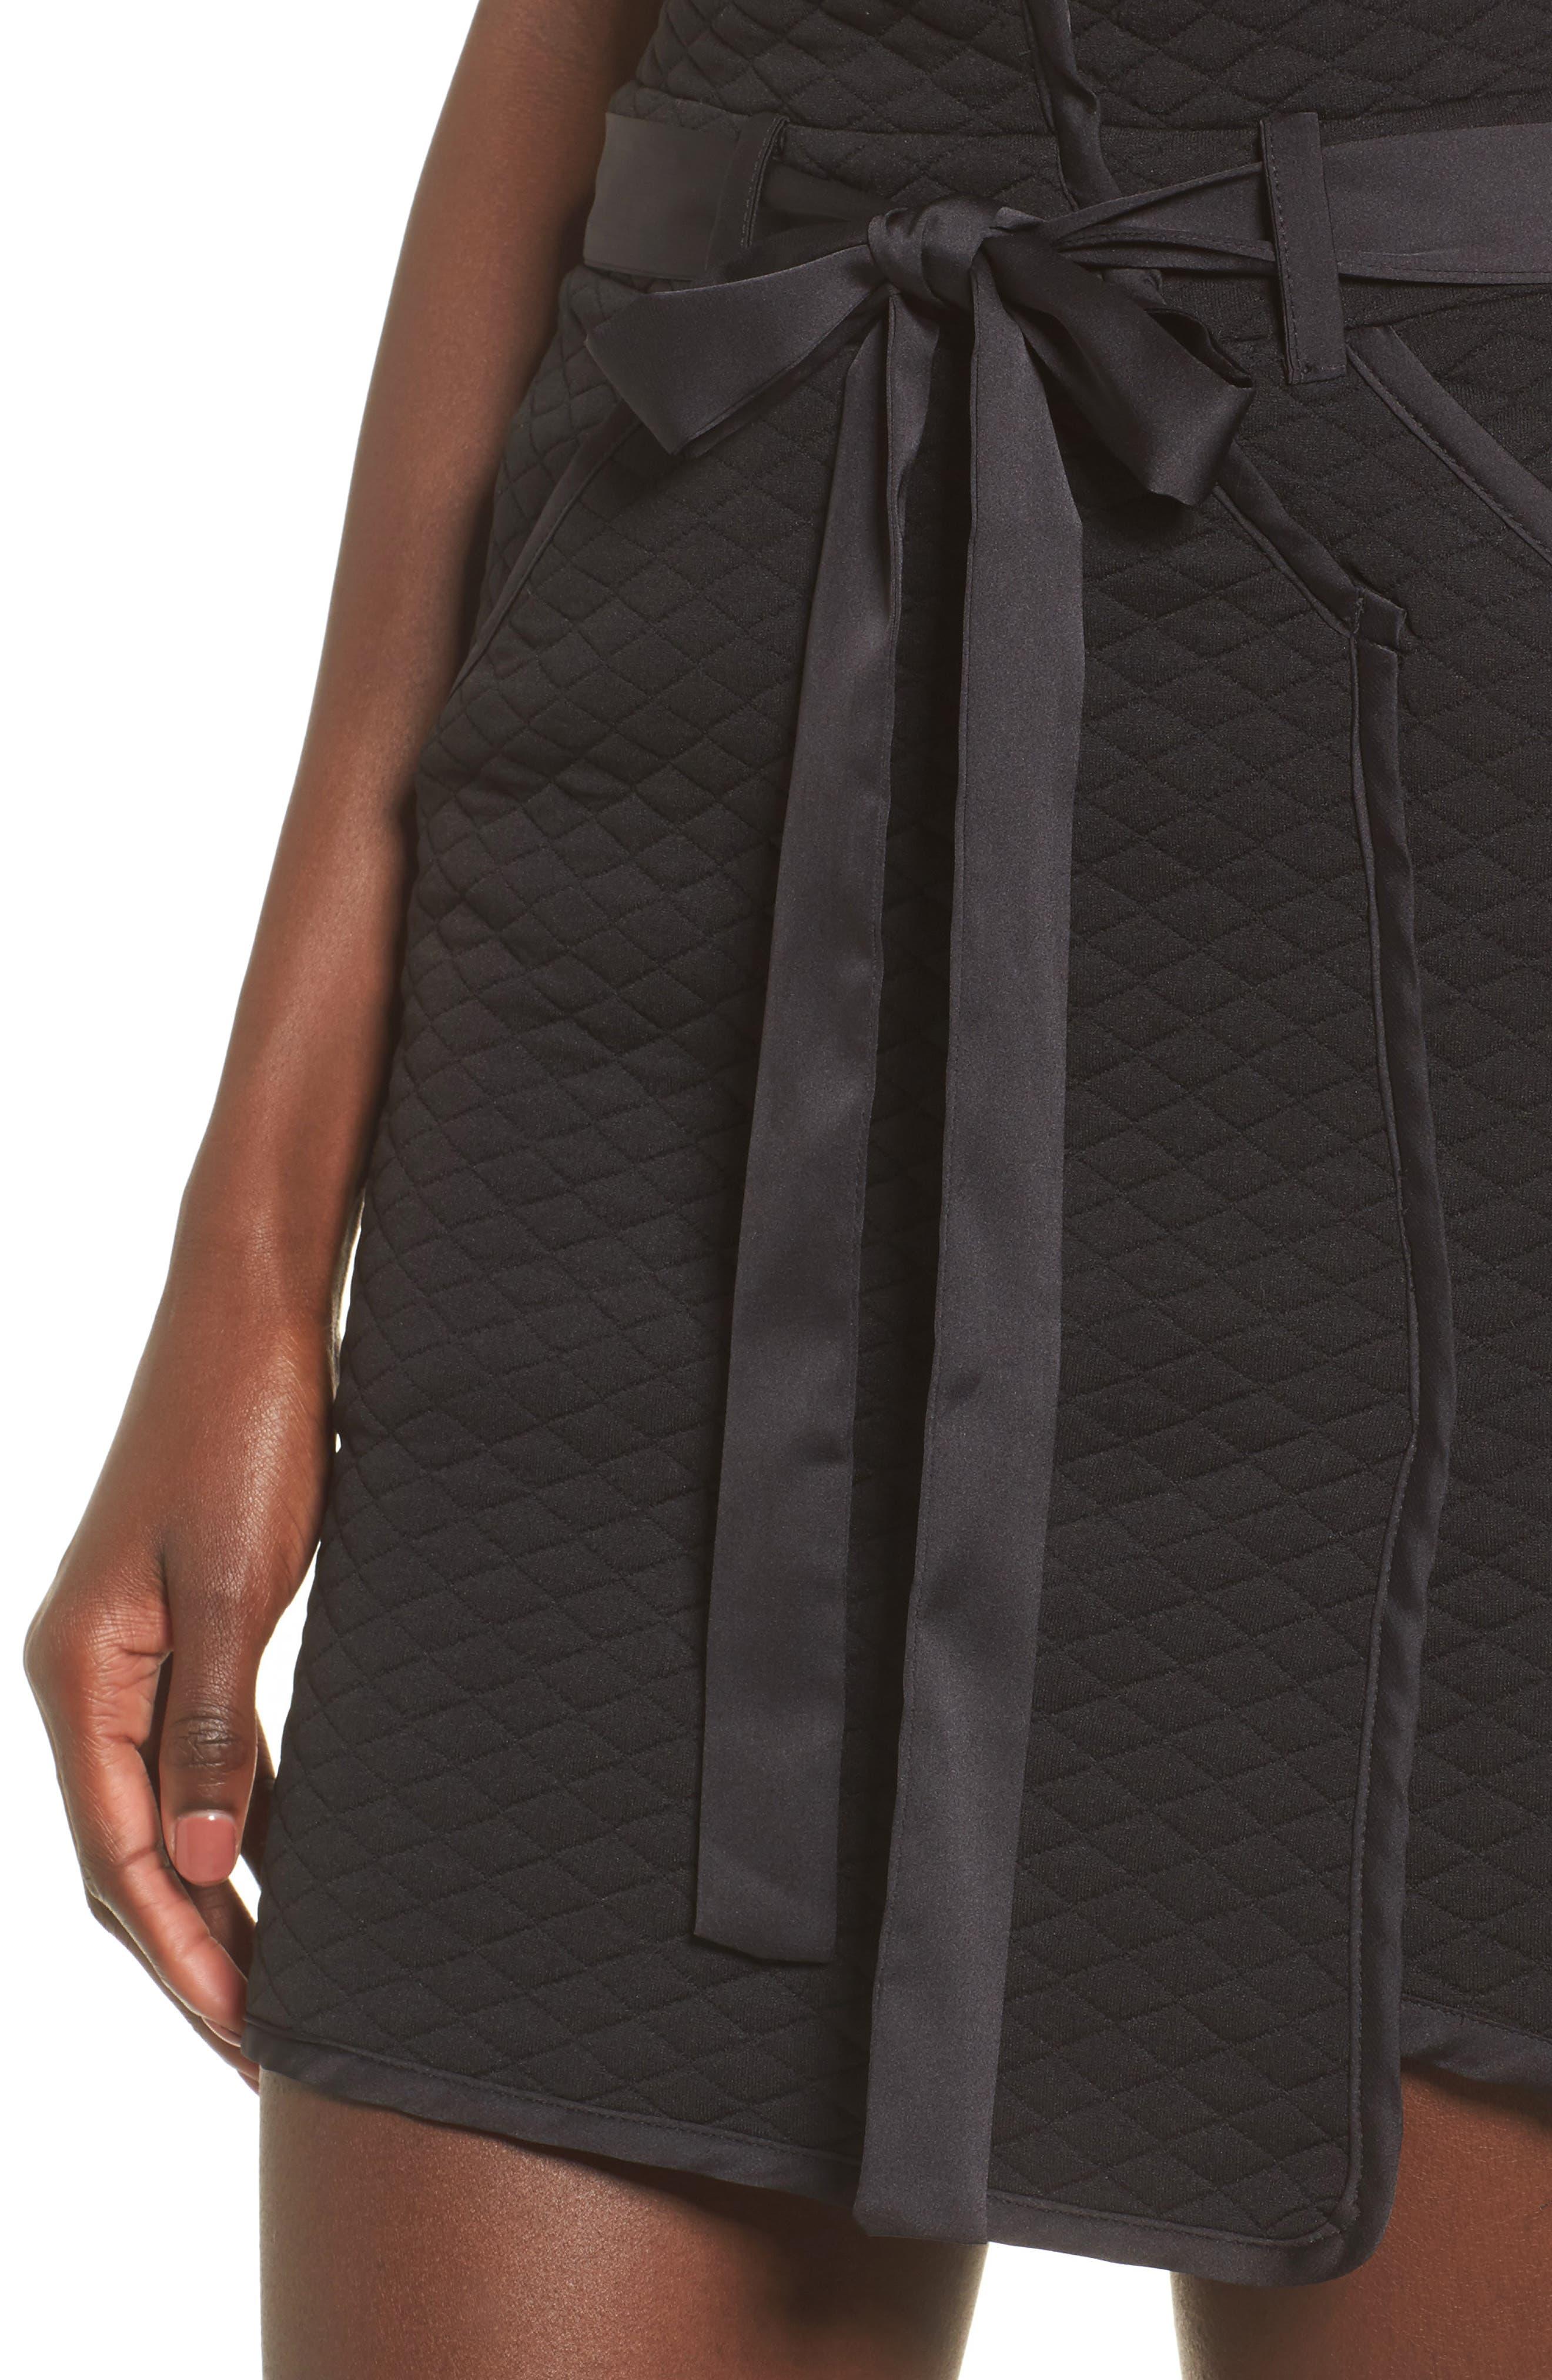 Andi Miniskirt,                             Alternate thumbnail 4, color,